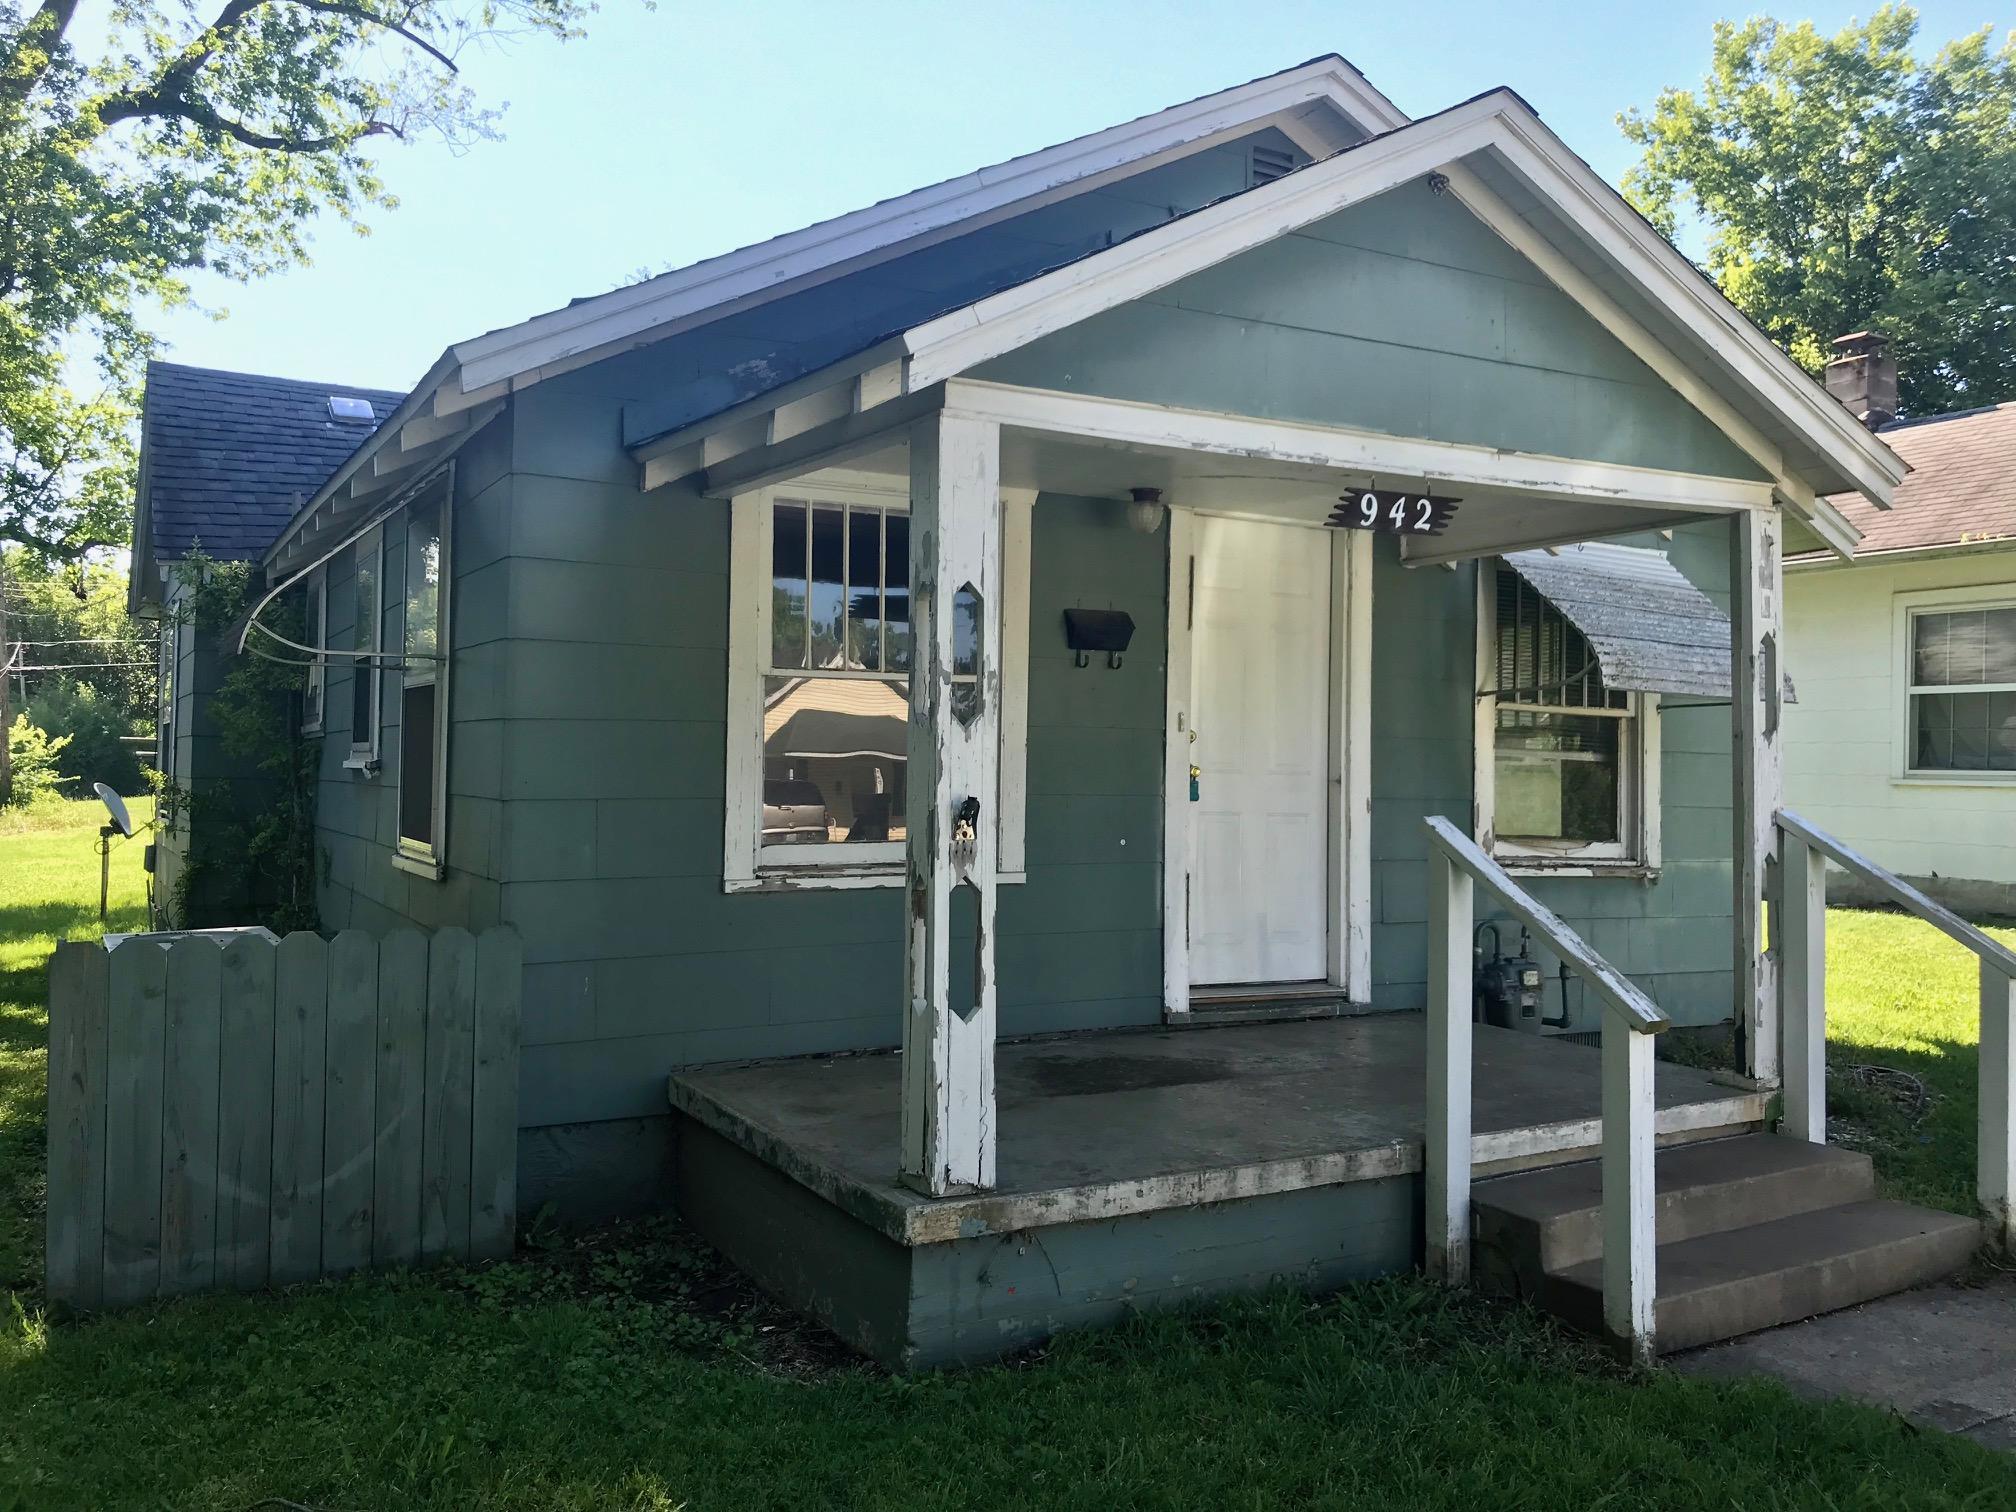 942 South Nettleton Avenue Springfield, MO 65806